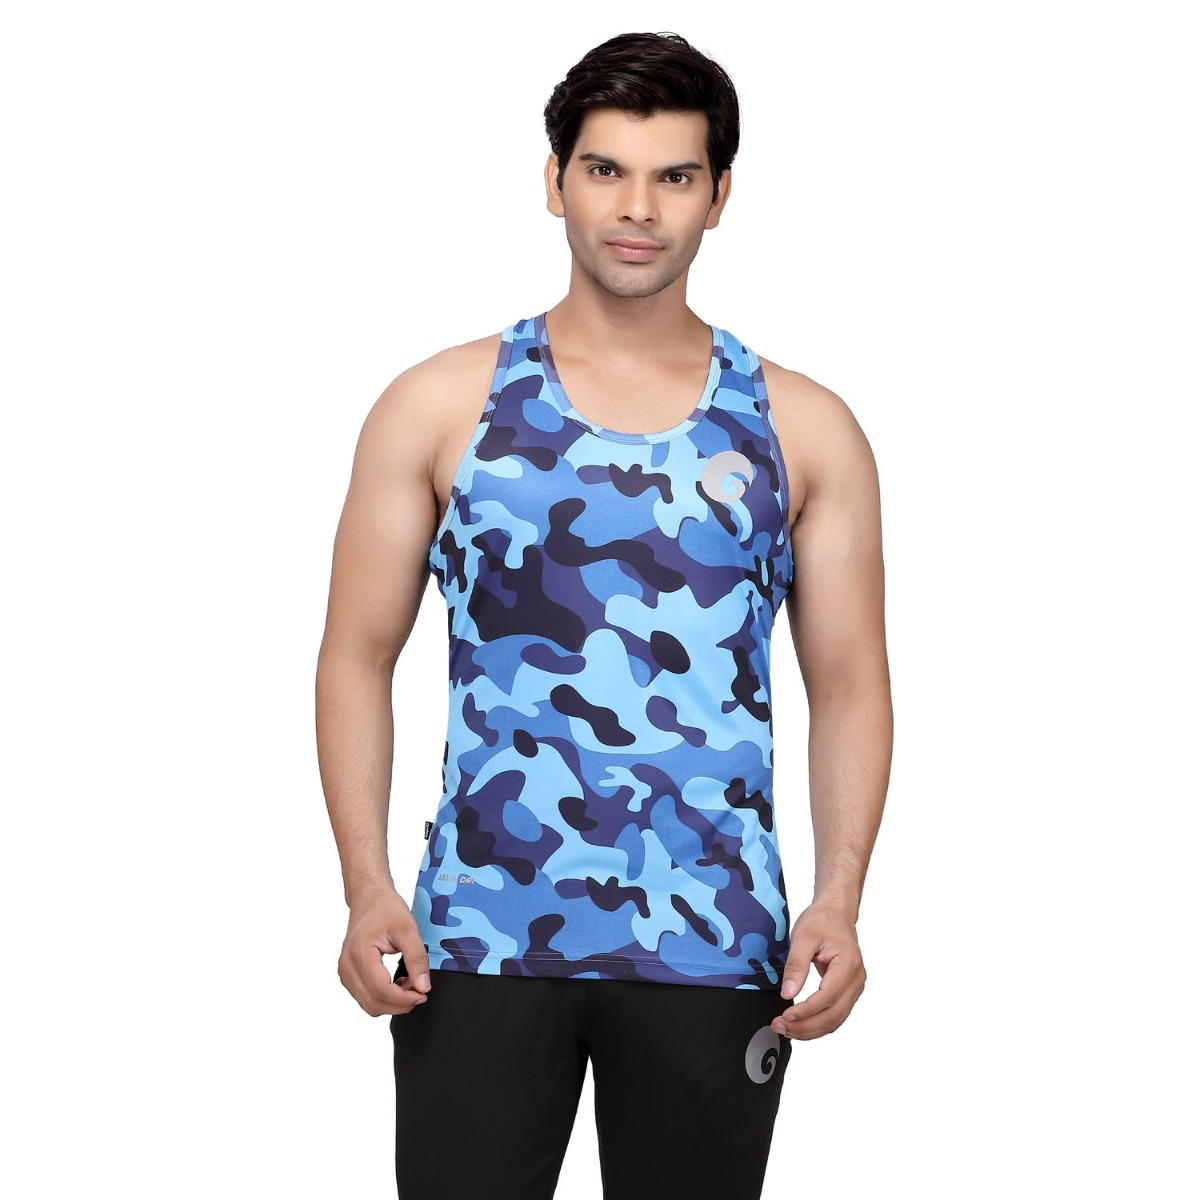 omtex Camo Blue - Sublimated Gym Tank